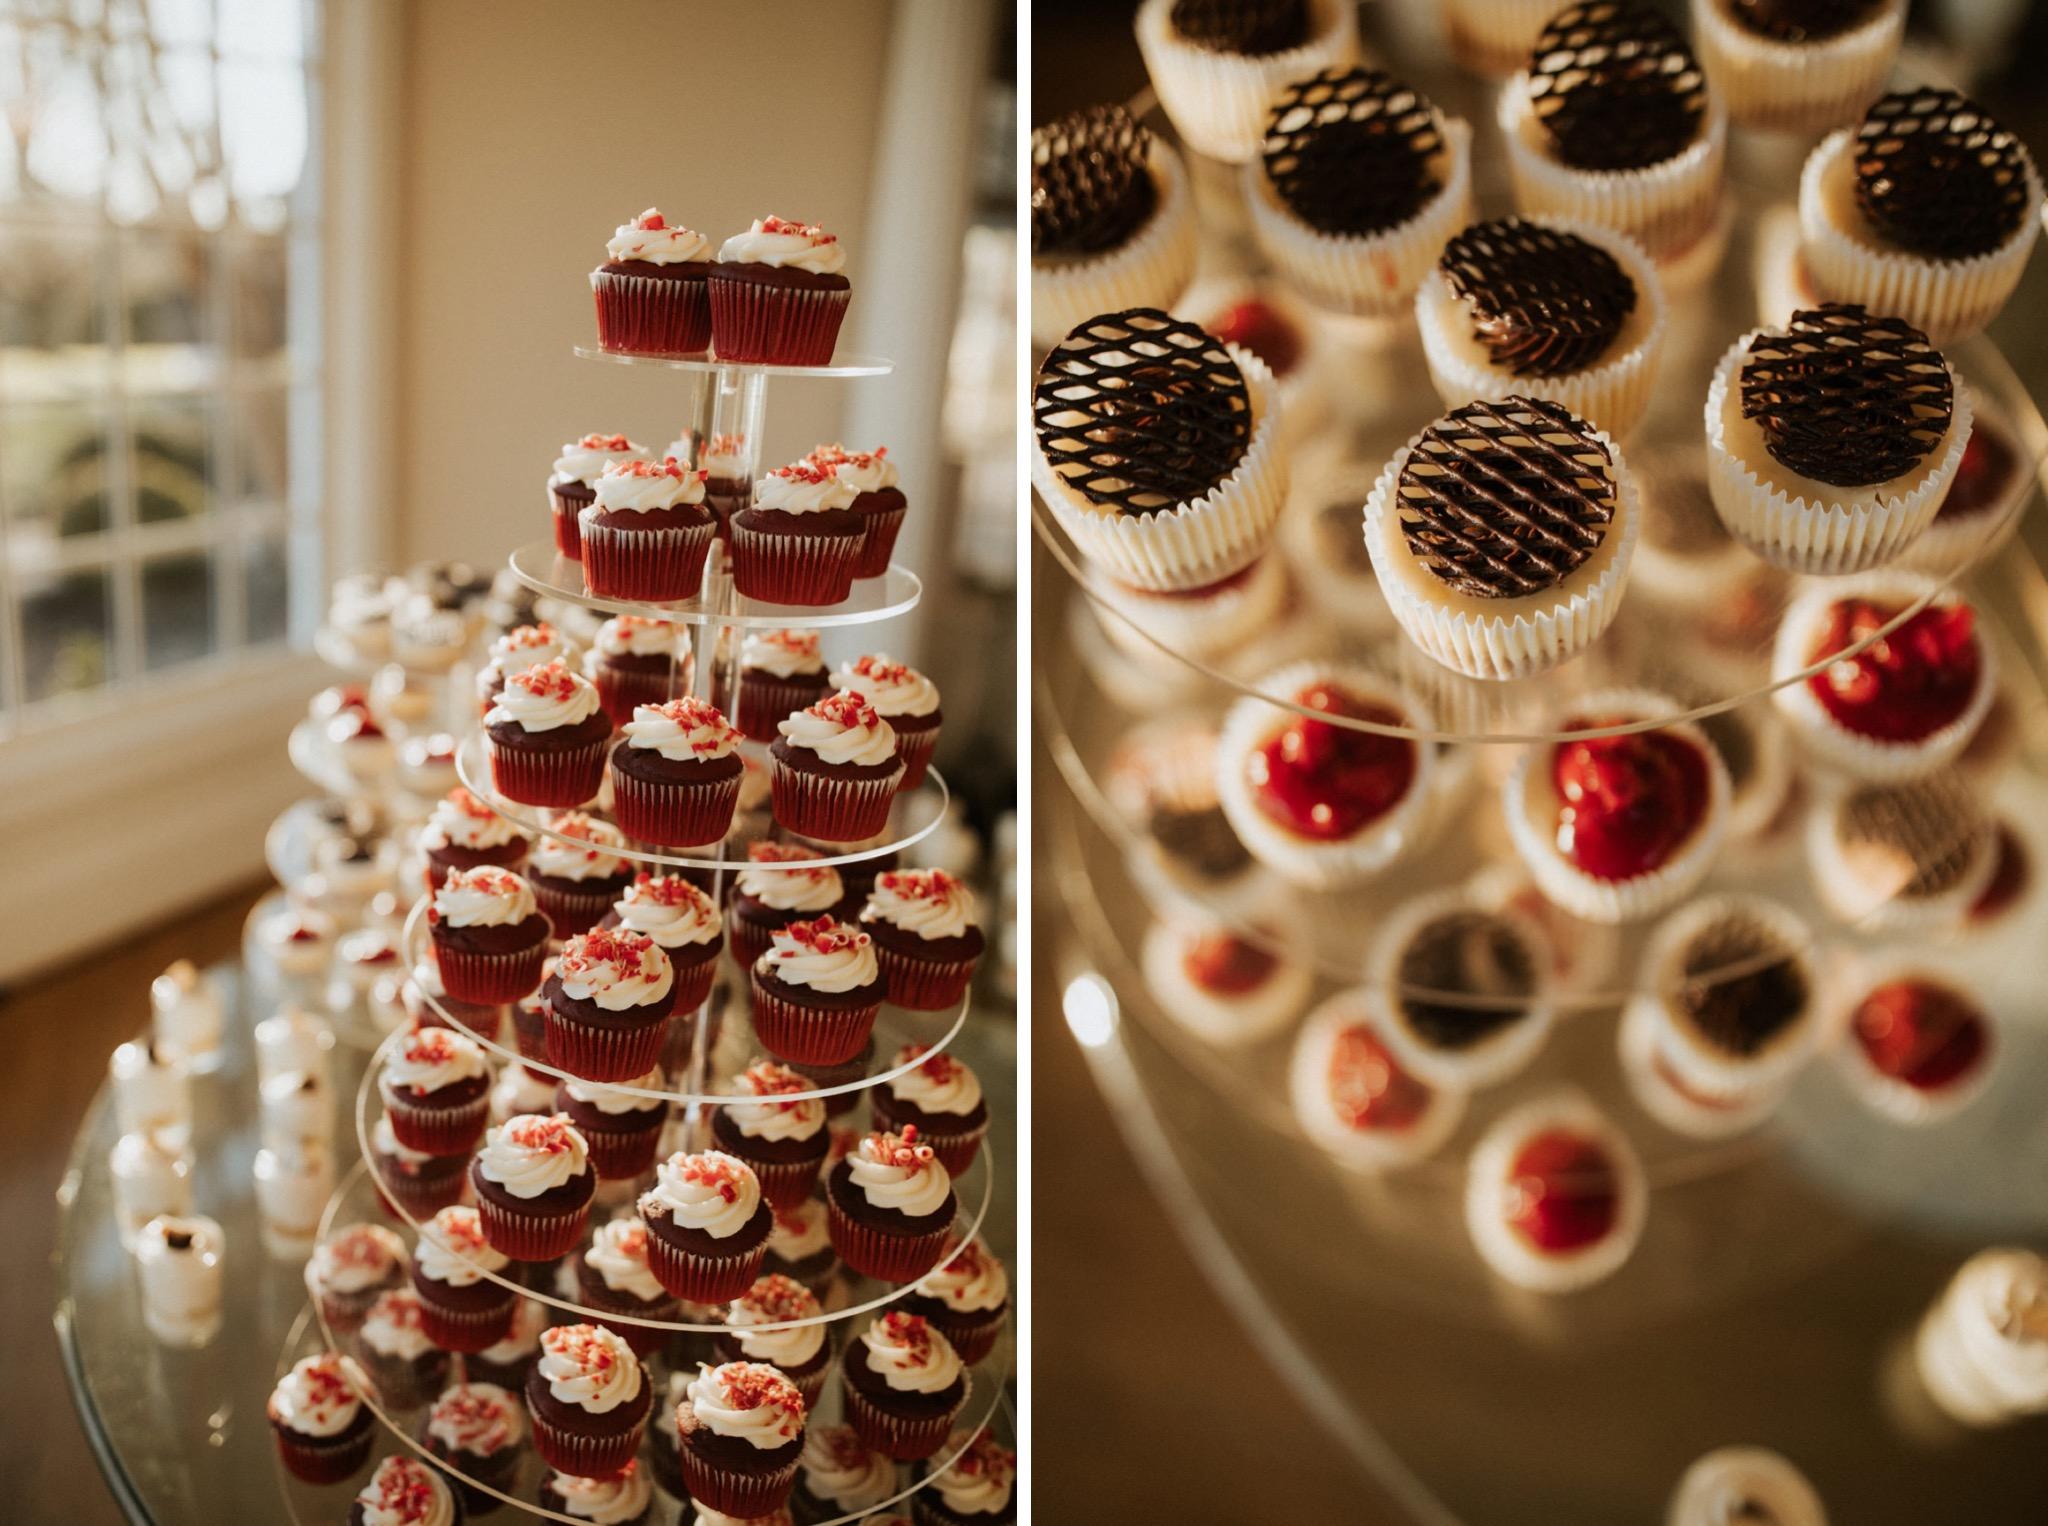 79_West Manor Estate Weddings - Pat Cori Photography-172_West Manor Estate Weddings - Pat Cori Photography-173_desserts_WestManorEstate_Cupcakes_Wedding.jpg